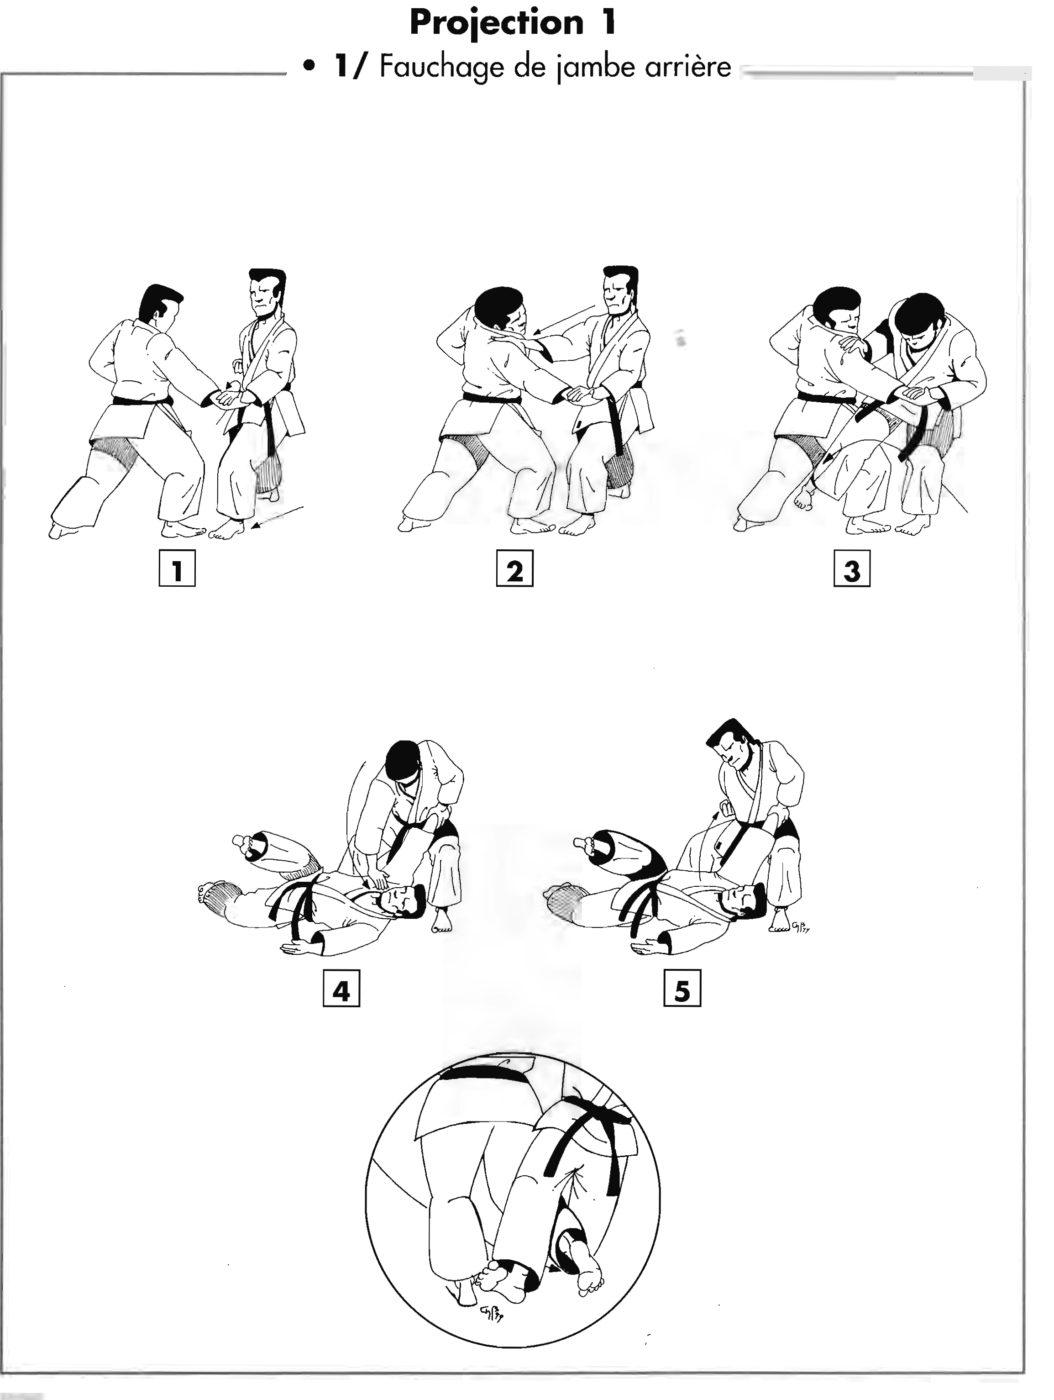 Projection : o soto gari – fauchage de la jambe arrière